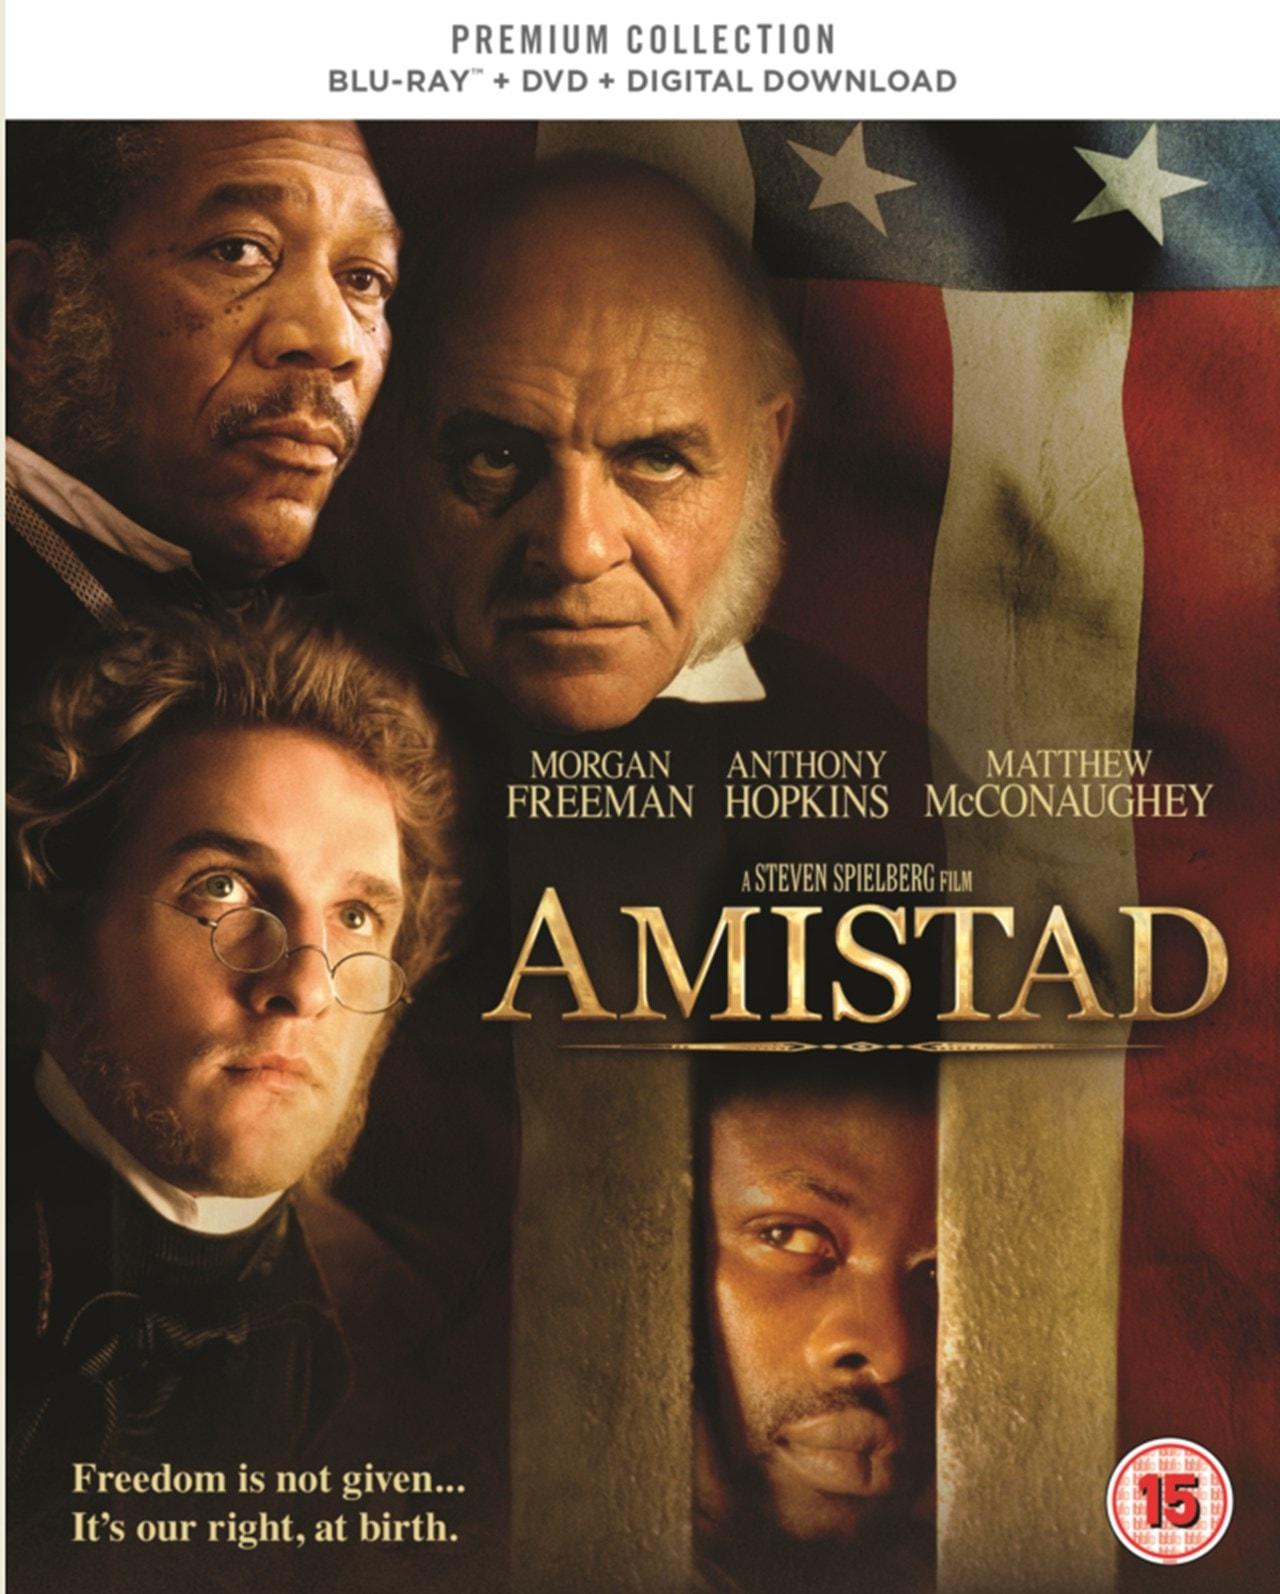 Amistad (hmv Exclusive) - The Premium Collection - 1